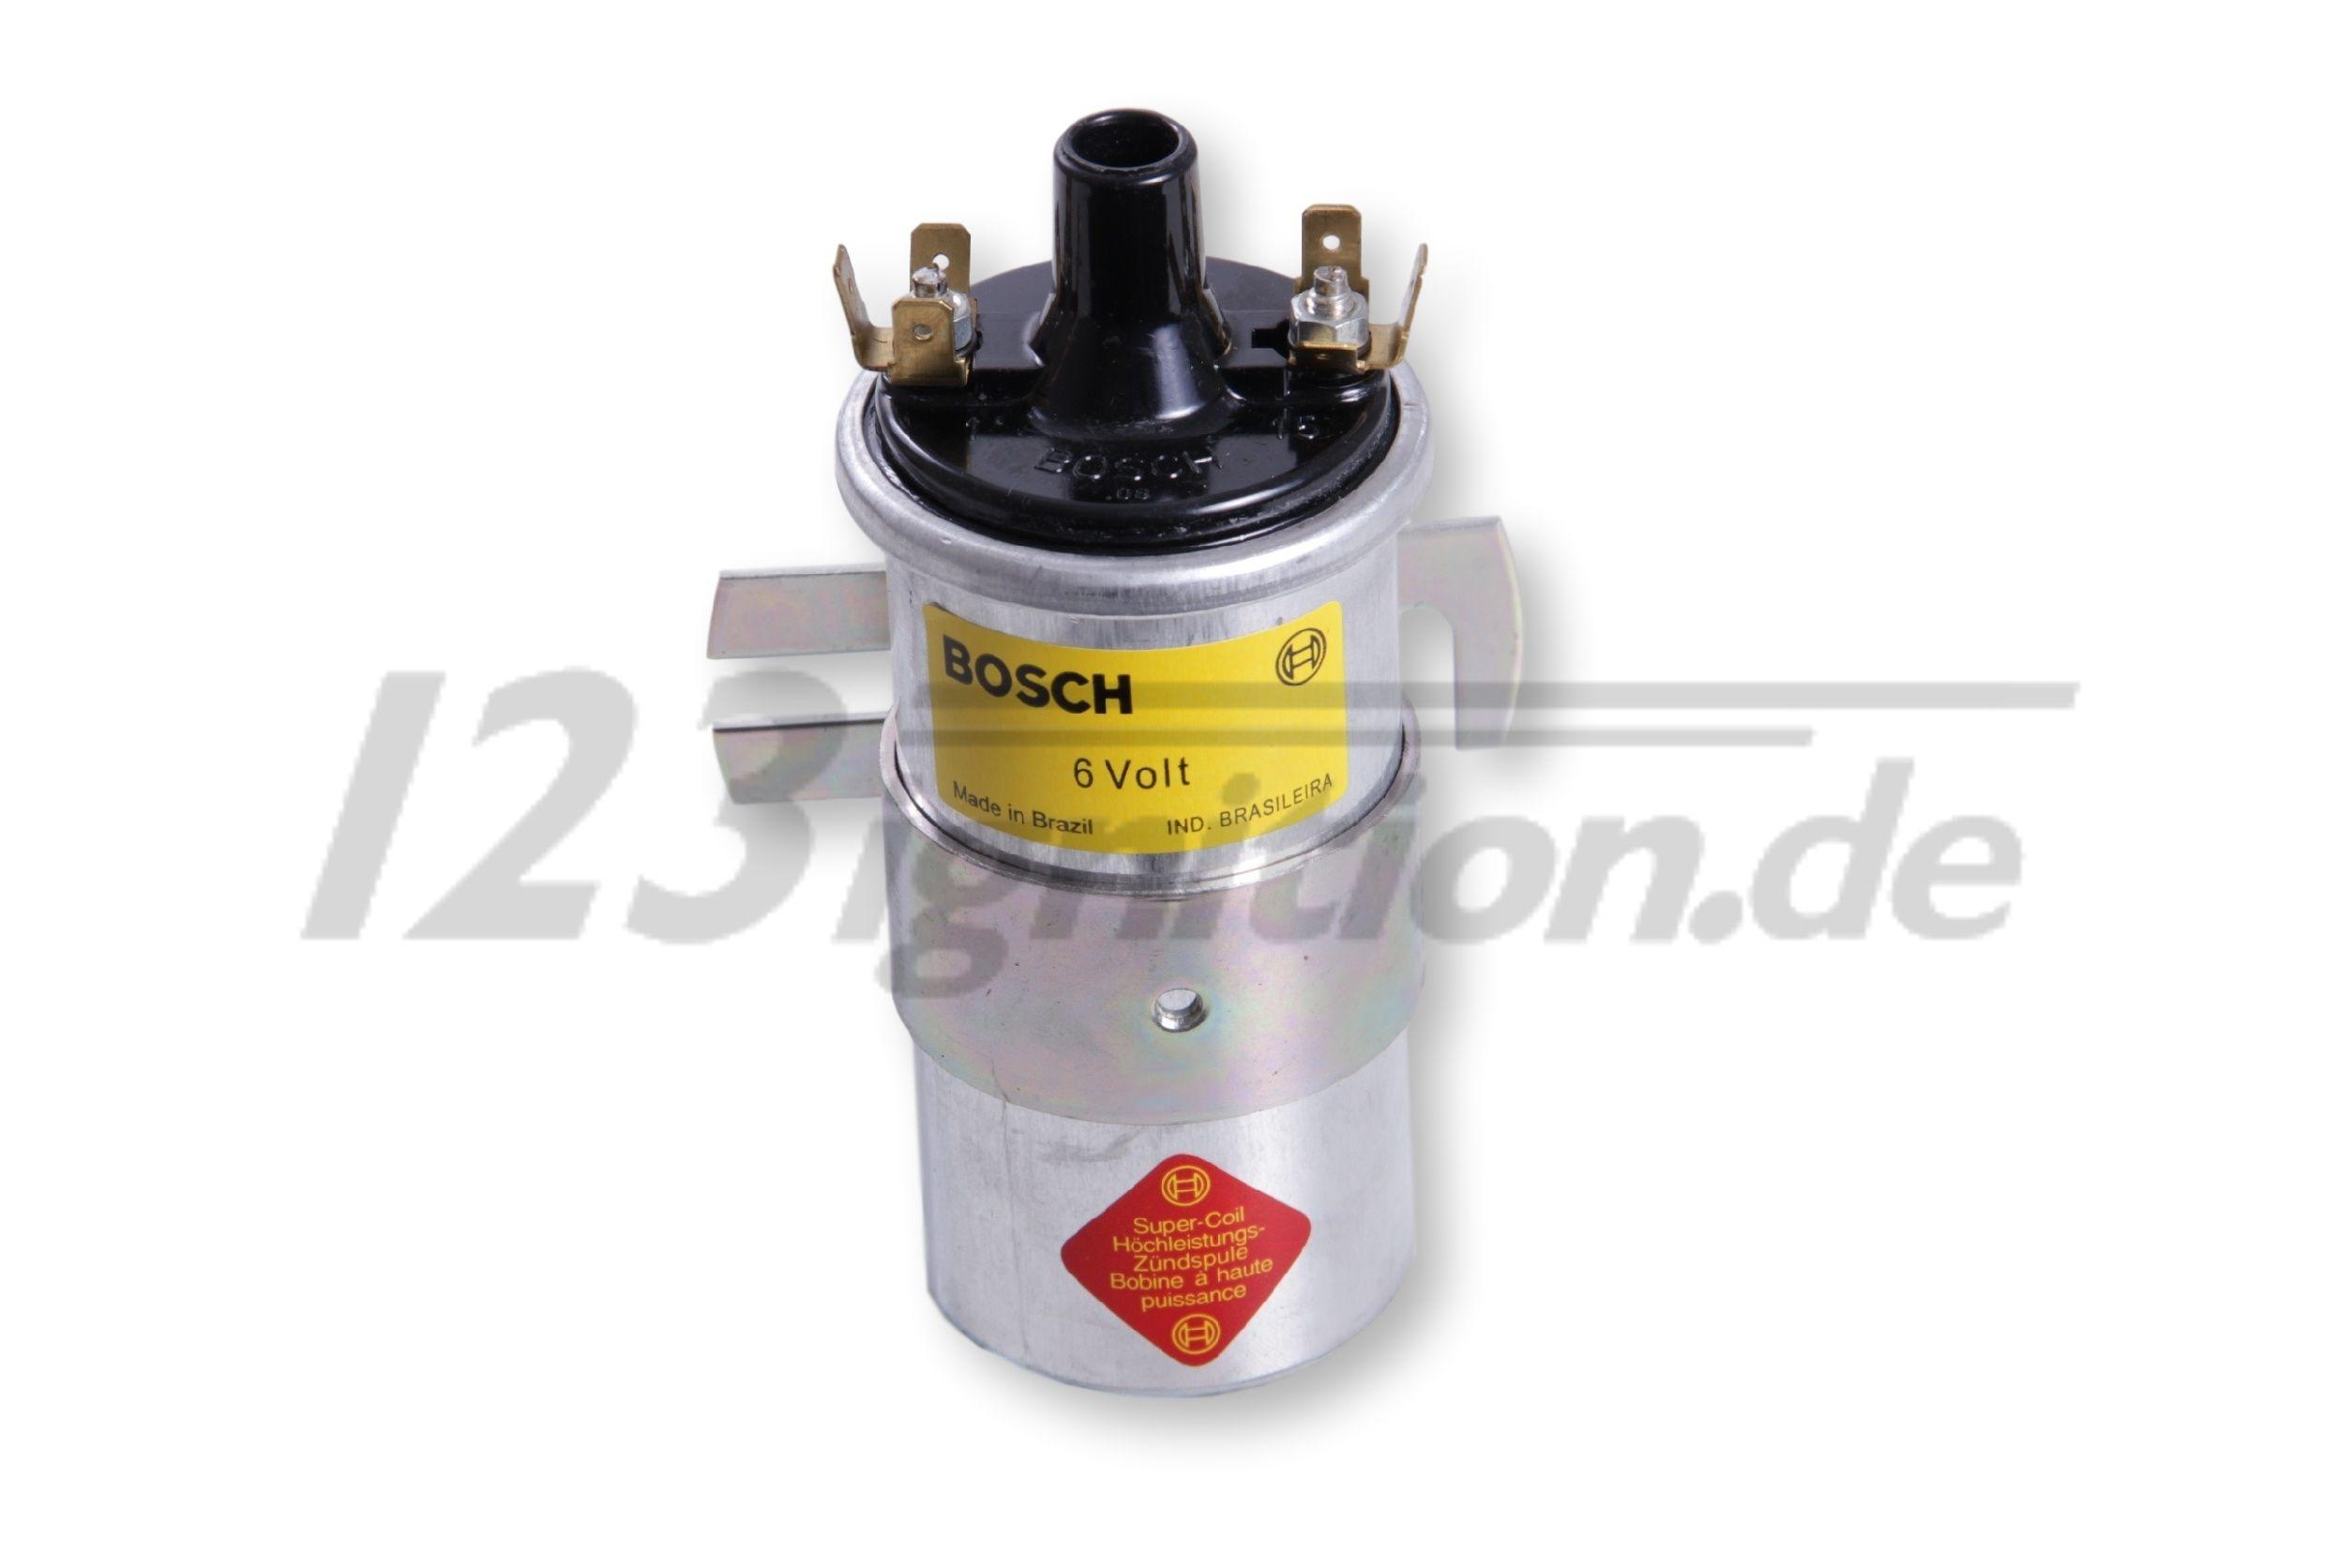 123 ignition   Bobine d allumage haute performance 6 V   Boutique en ... 6fac9416ca99